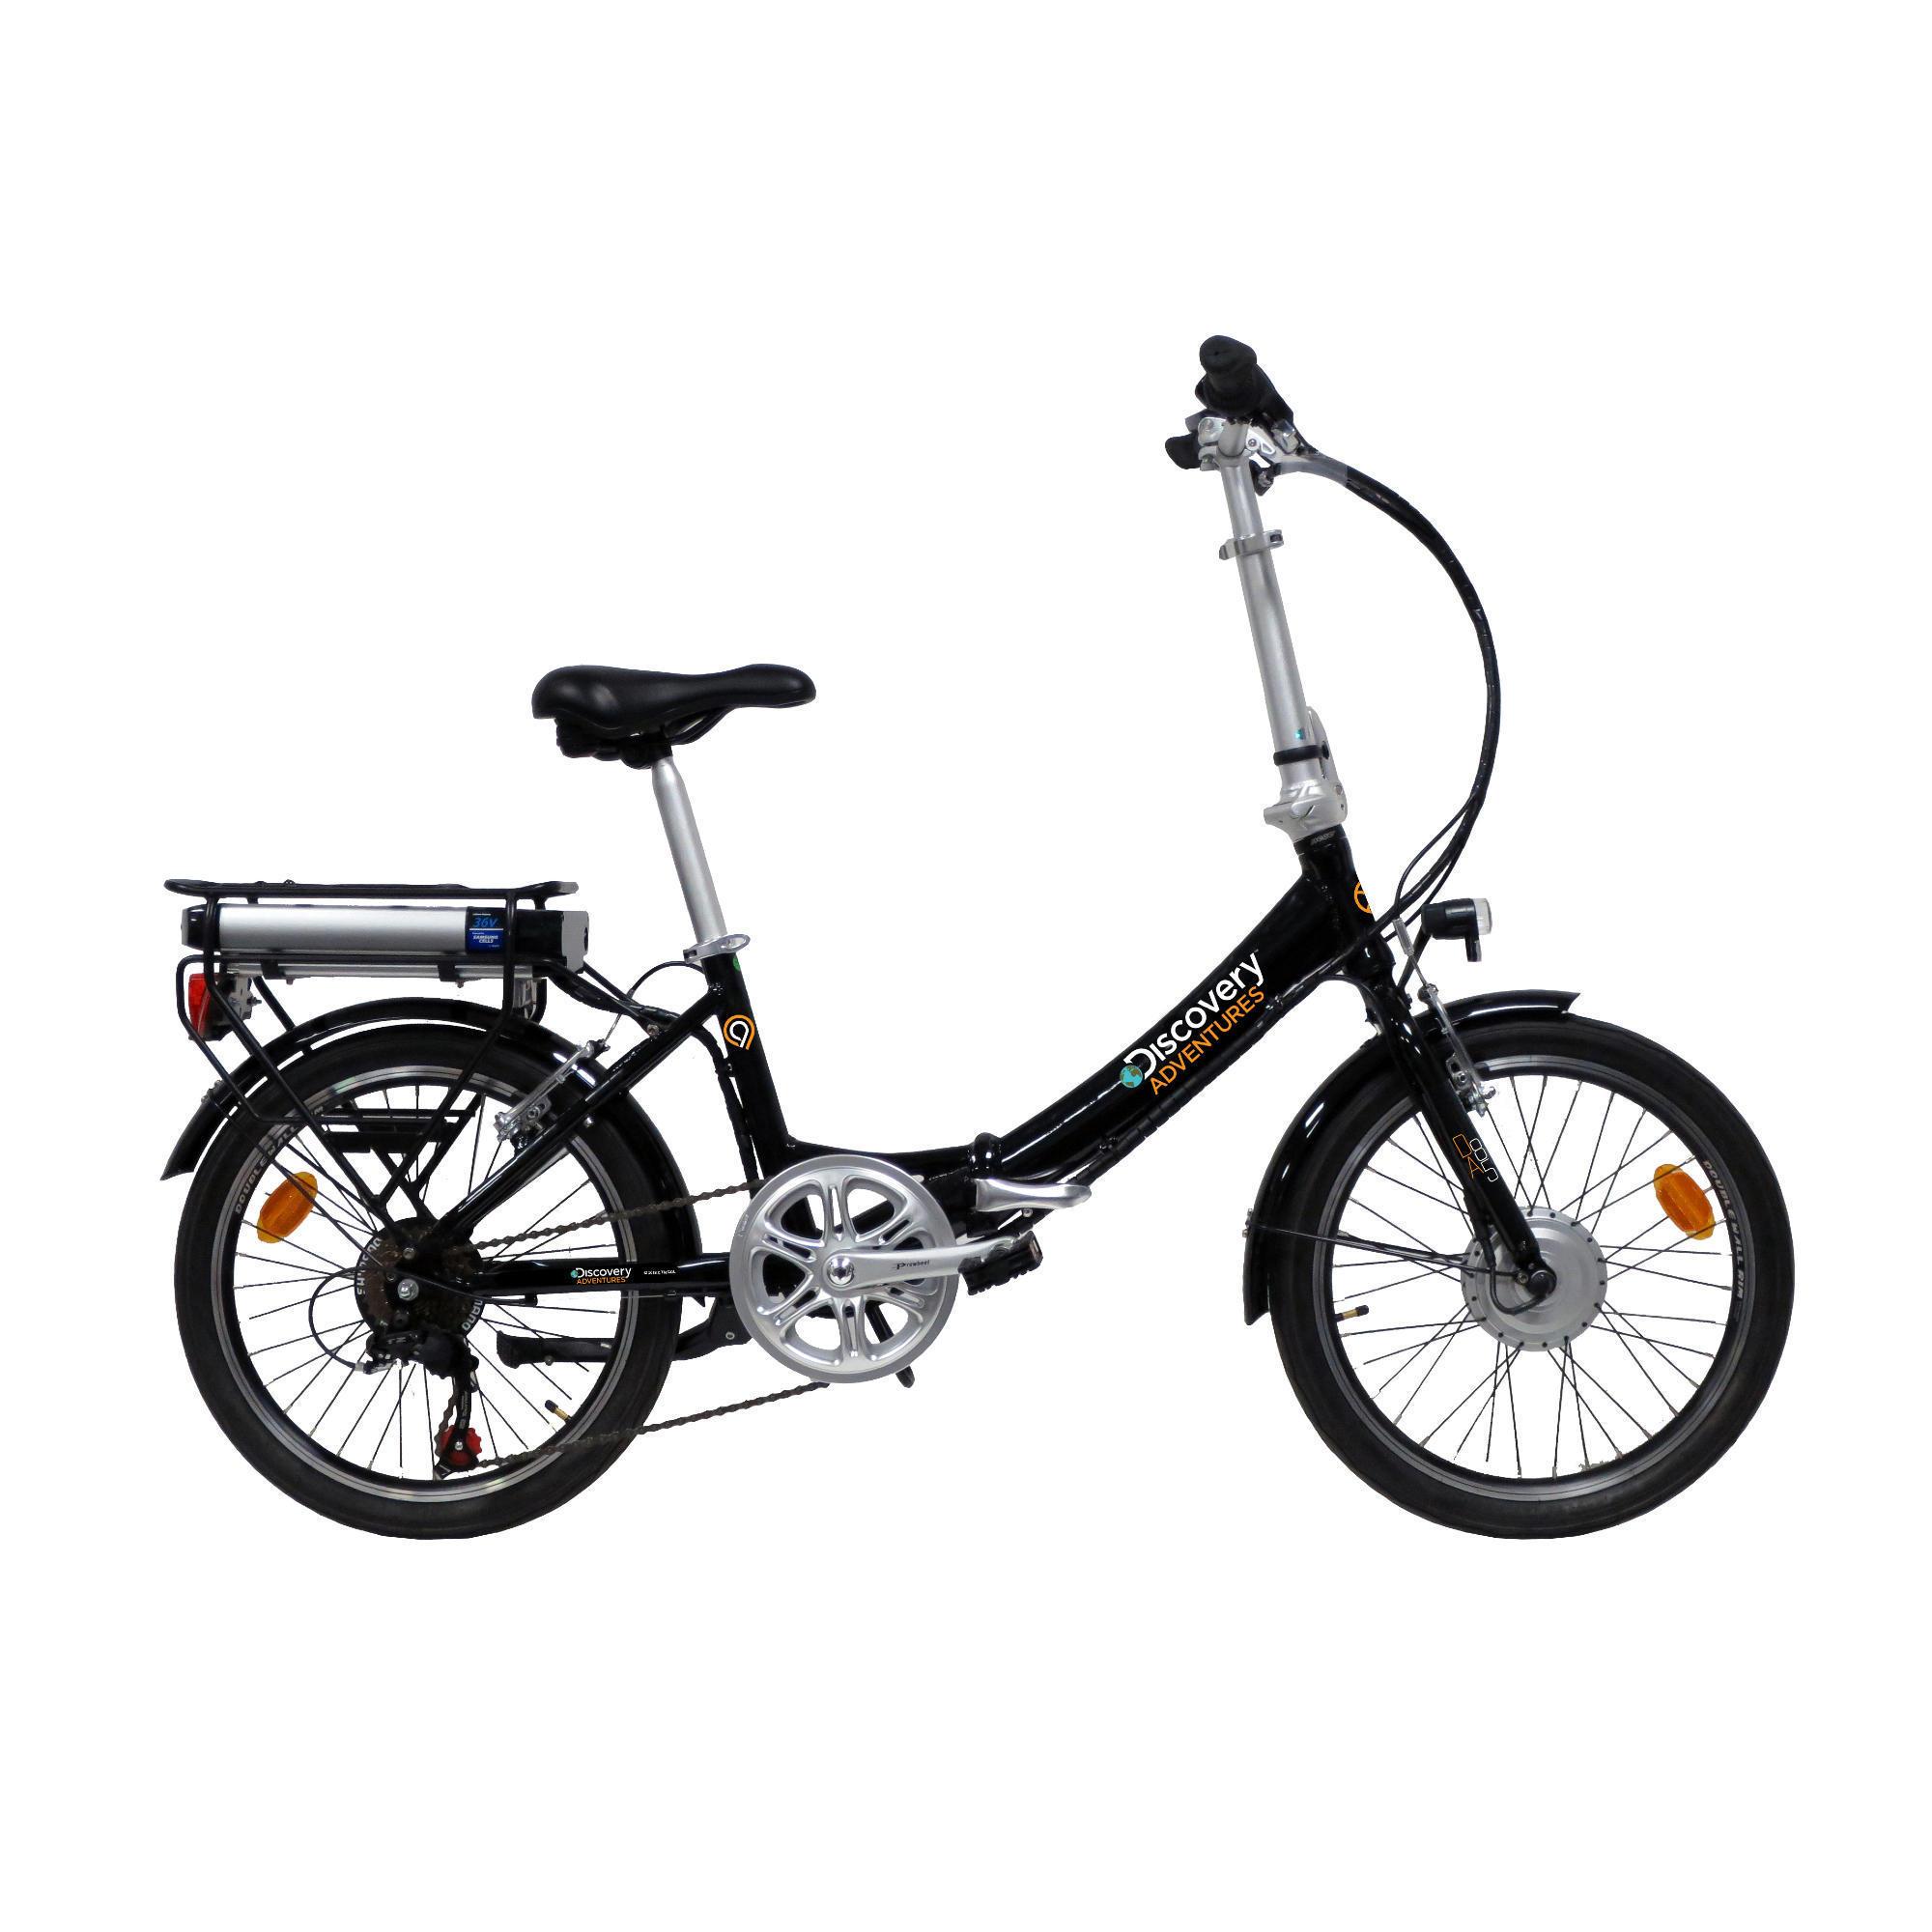 Comprar la bicicleta eléctrica plegable Discovery Adventures E2000